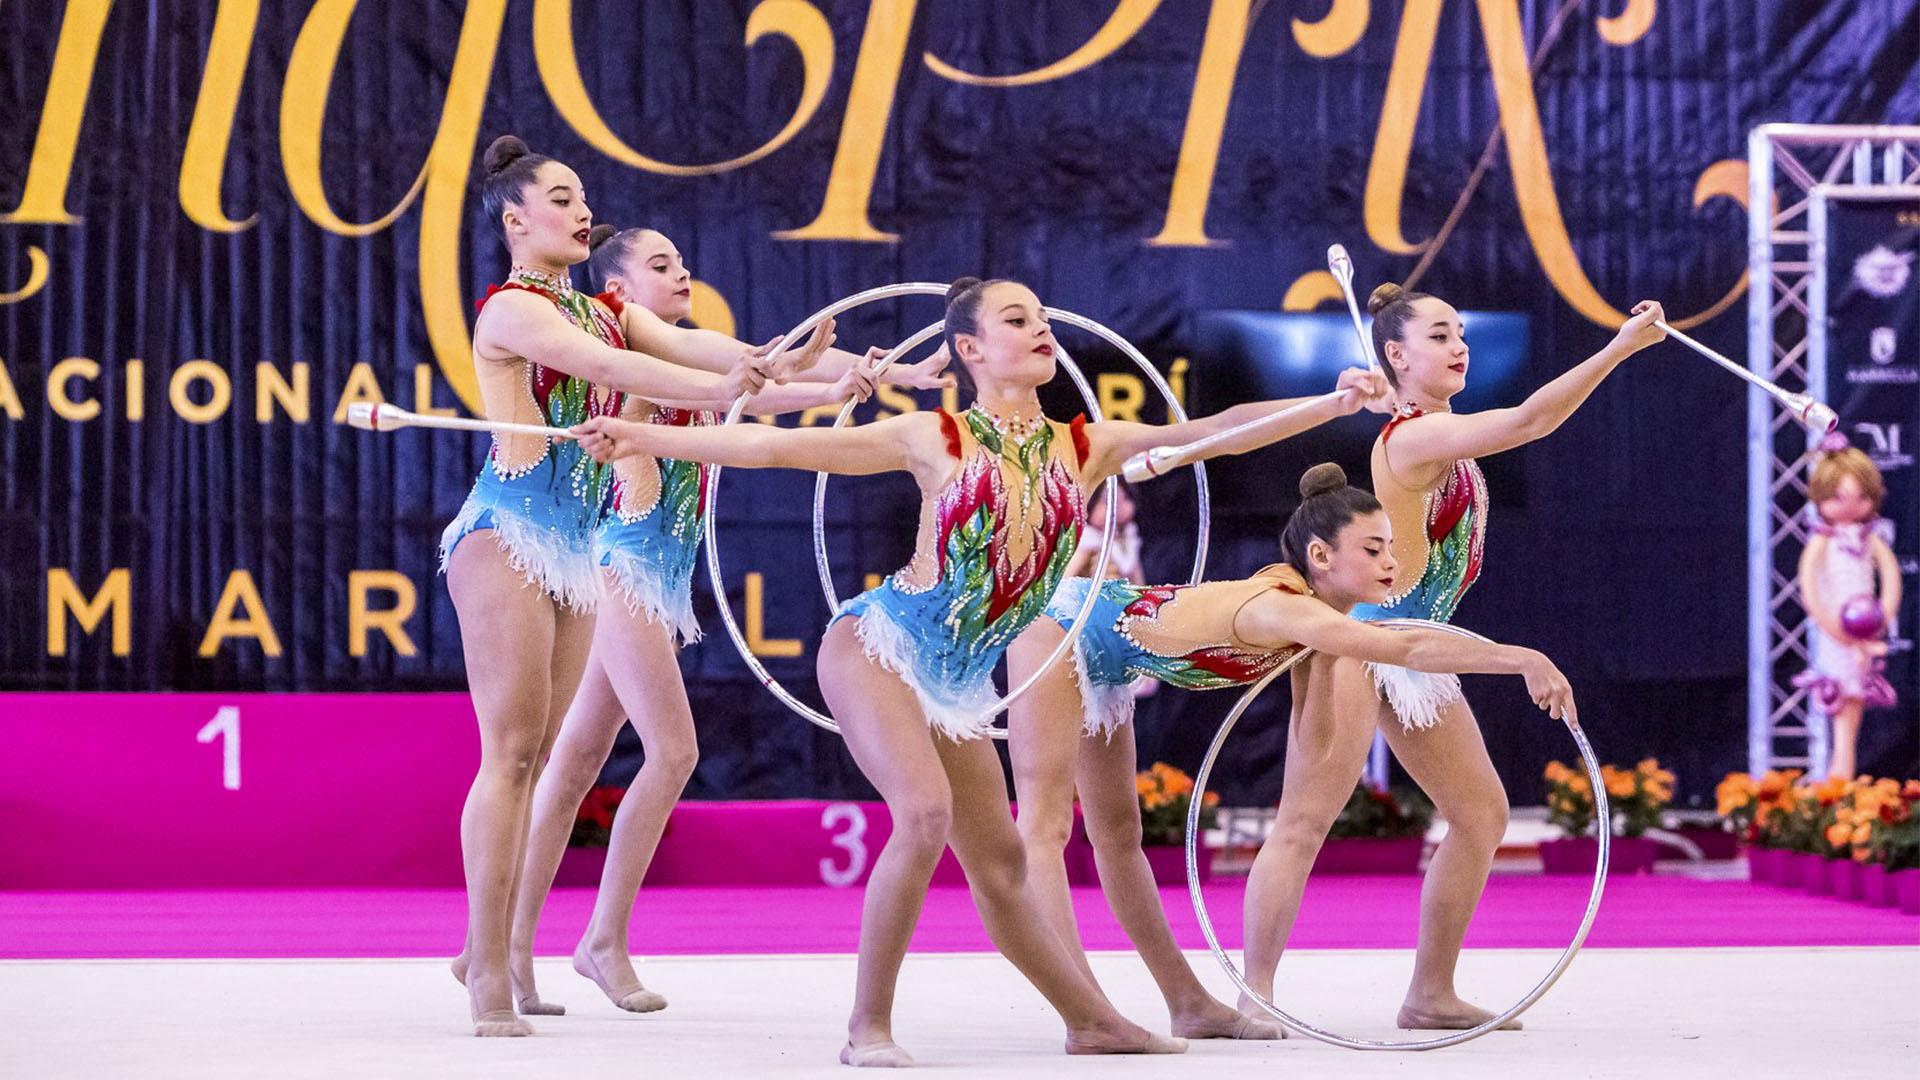 Vuelve el International Grand Prix al Palacio de los Deportes Elena Benítez de San Pedro Alcántara